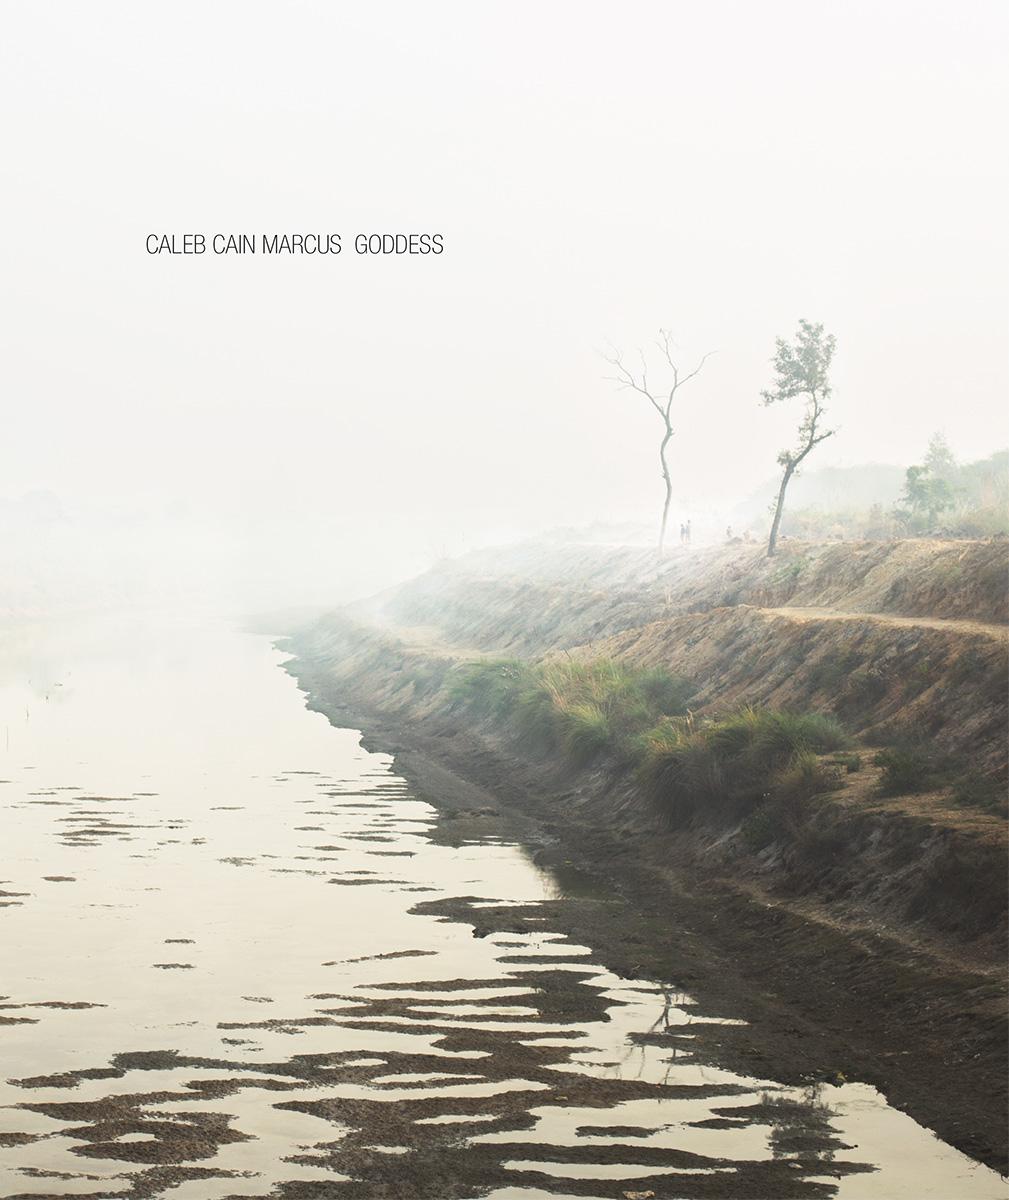 'Godess' by Calen Cain Marcus (© Caleb Cain Marcus)